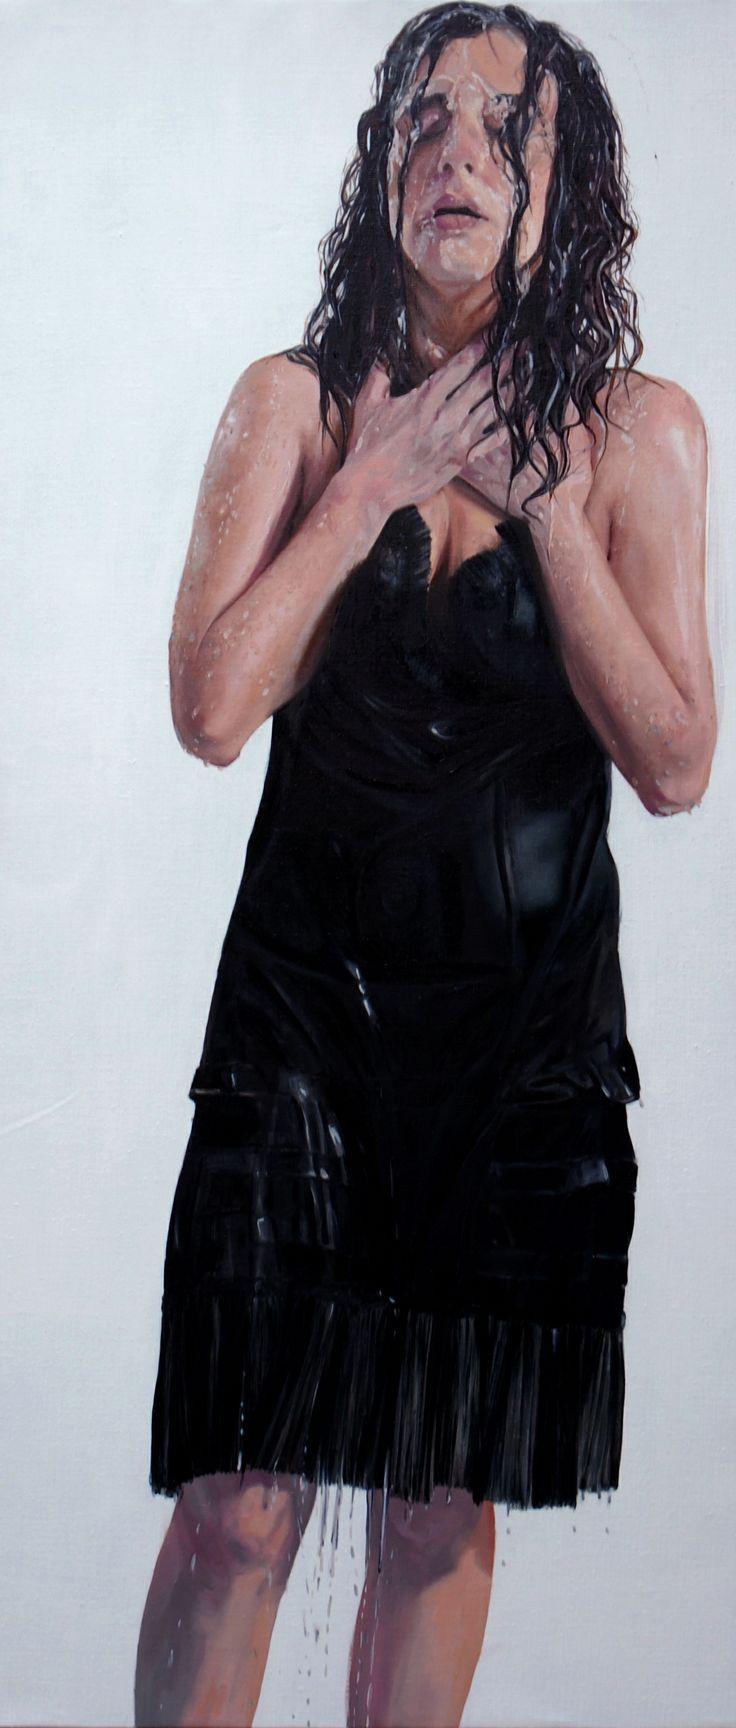 óleo sobre tela 180x 80 cm 2010.nicole tijoux